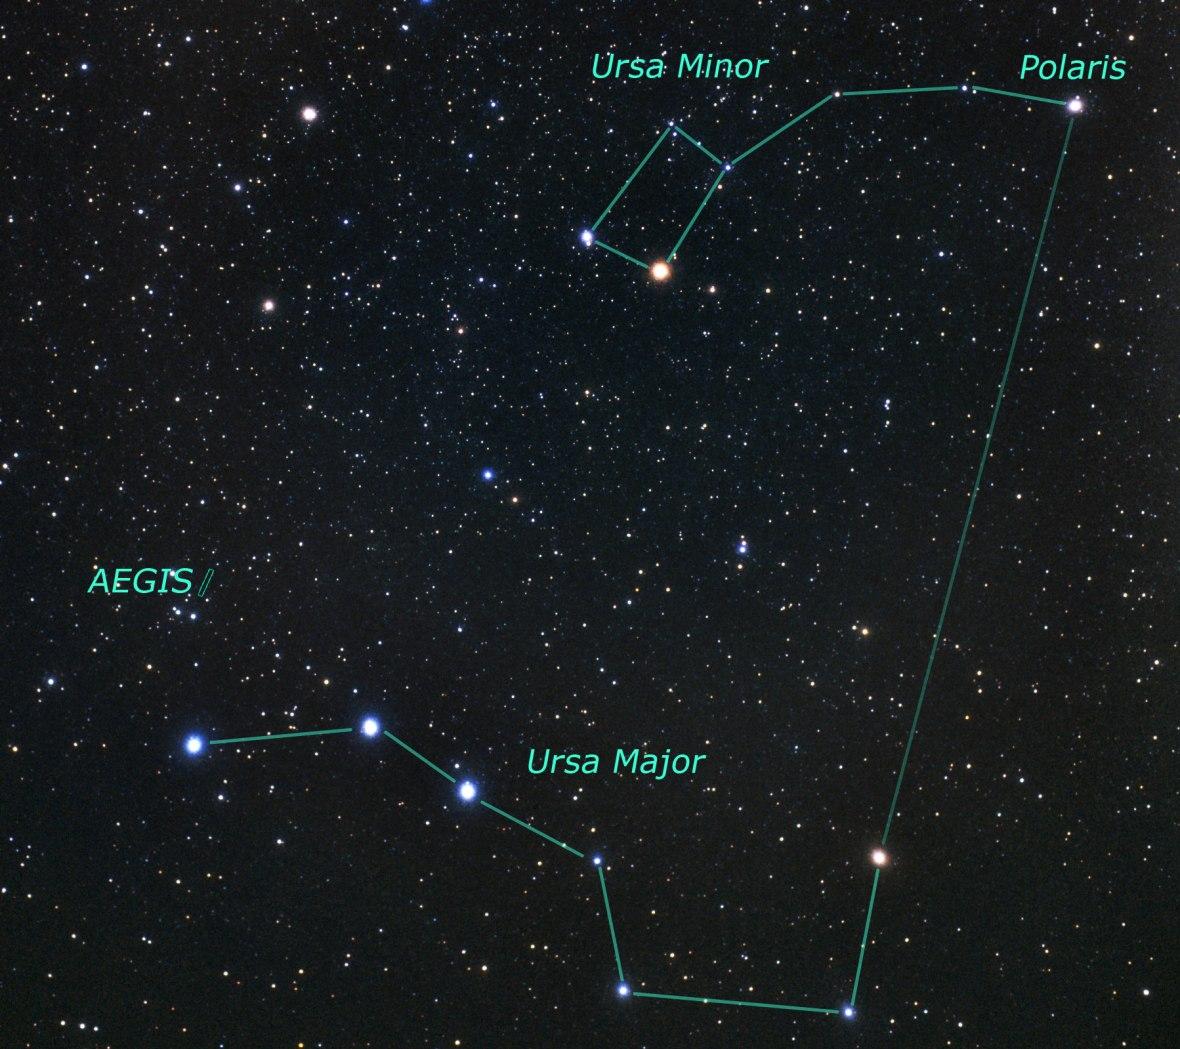 https://www.sallyridescience.com/google_earth_sky/polaris